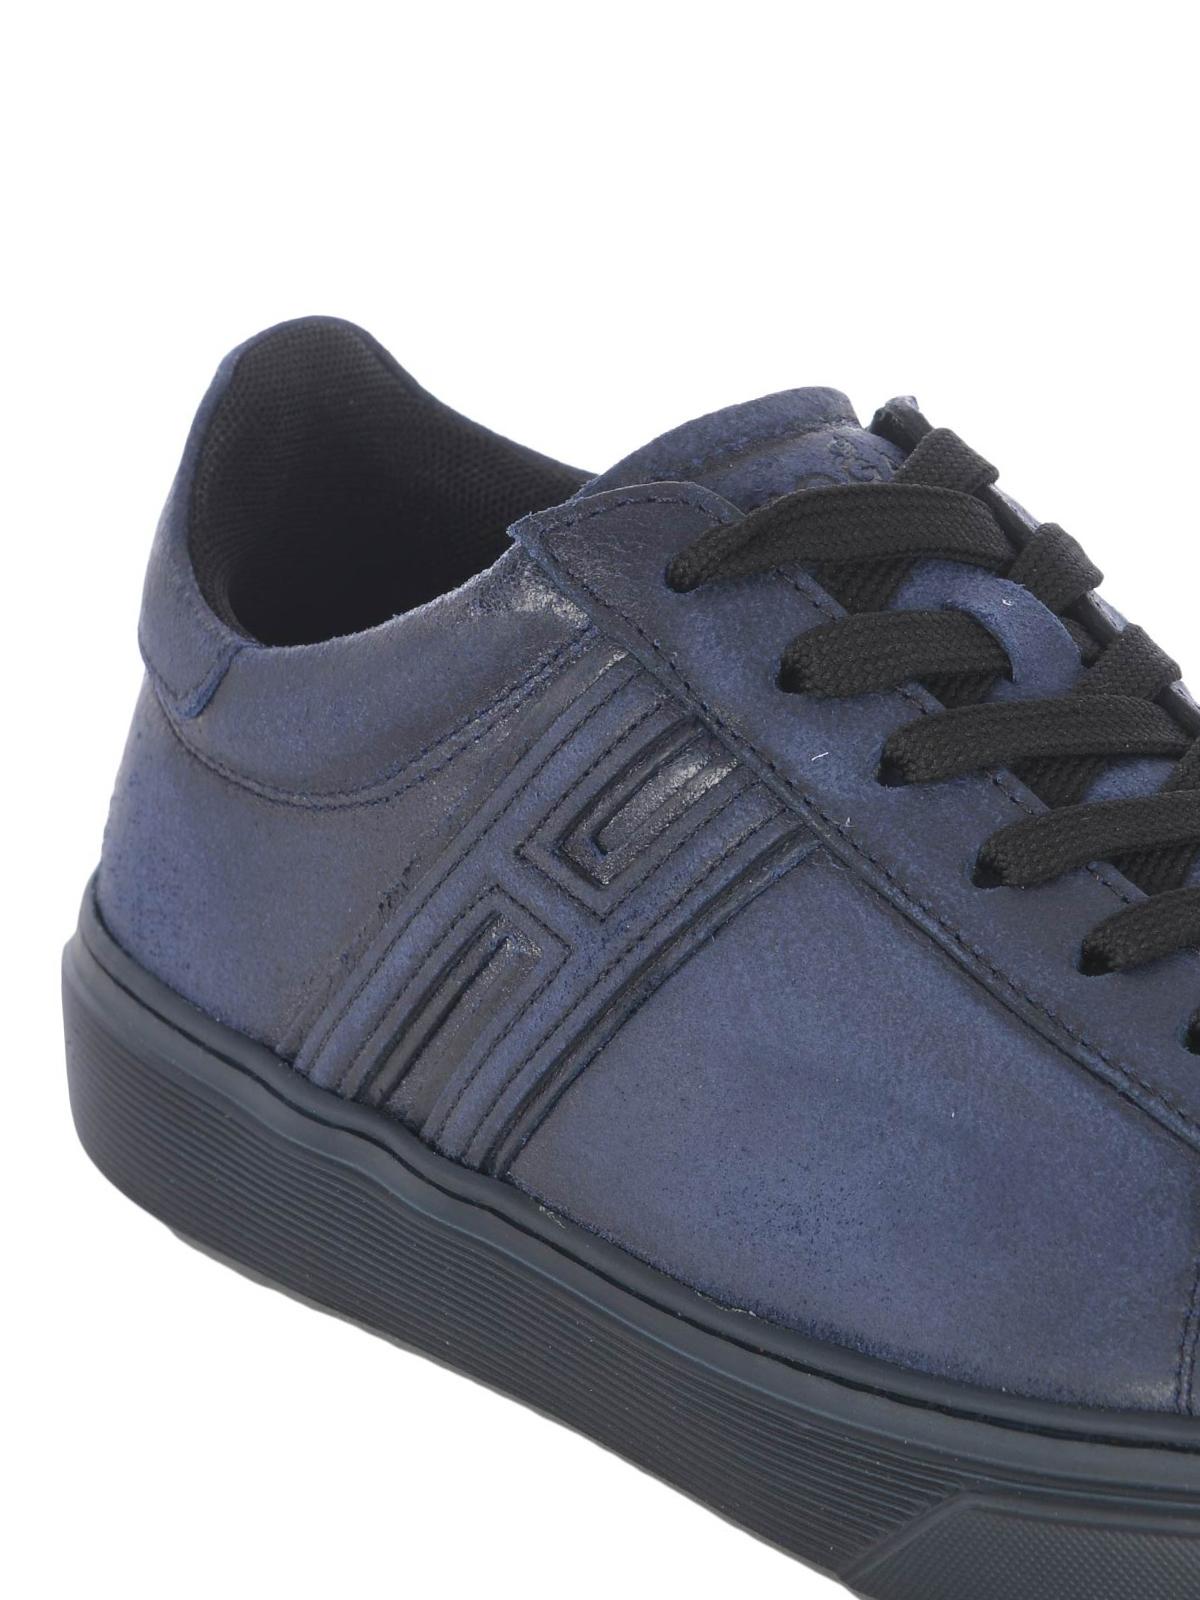 Hogan - H365 blue split leather